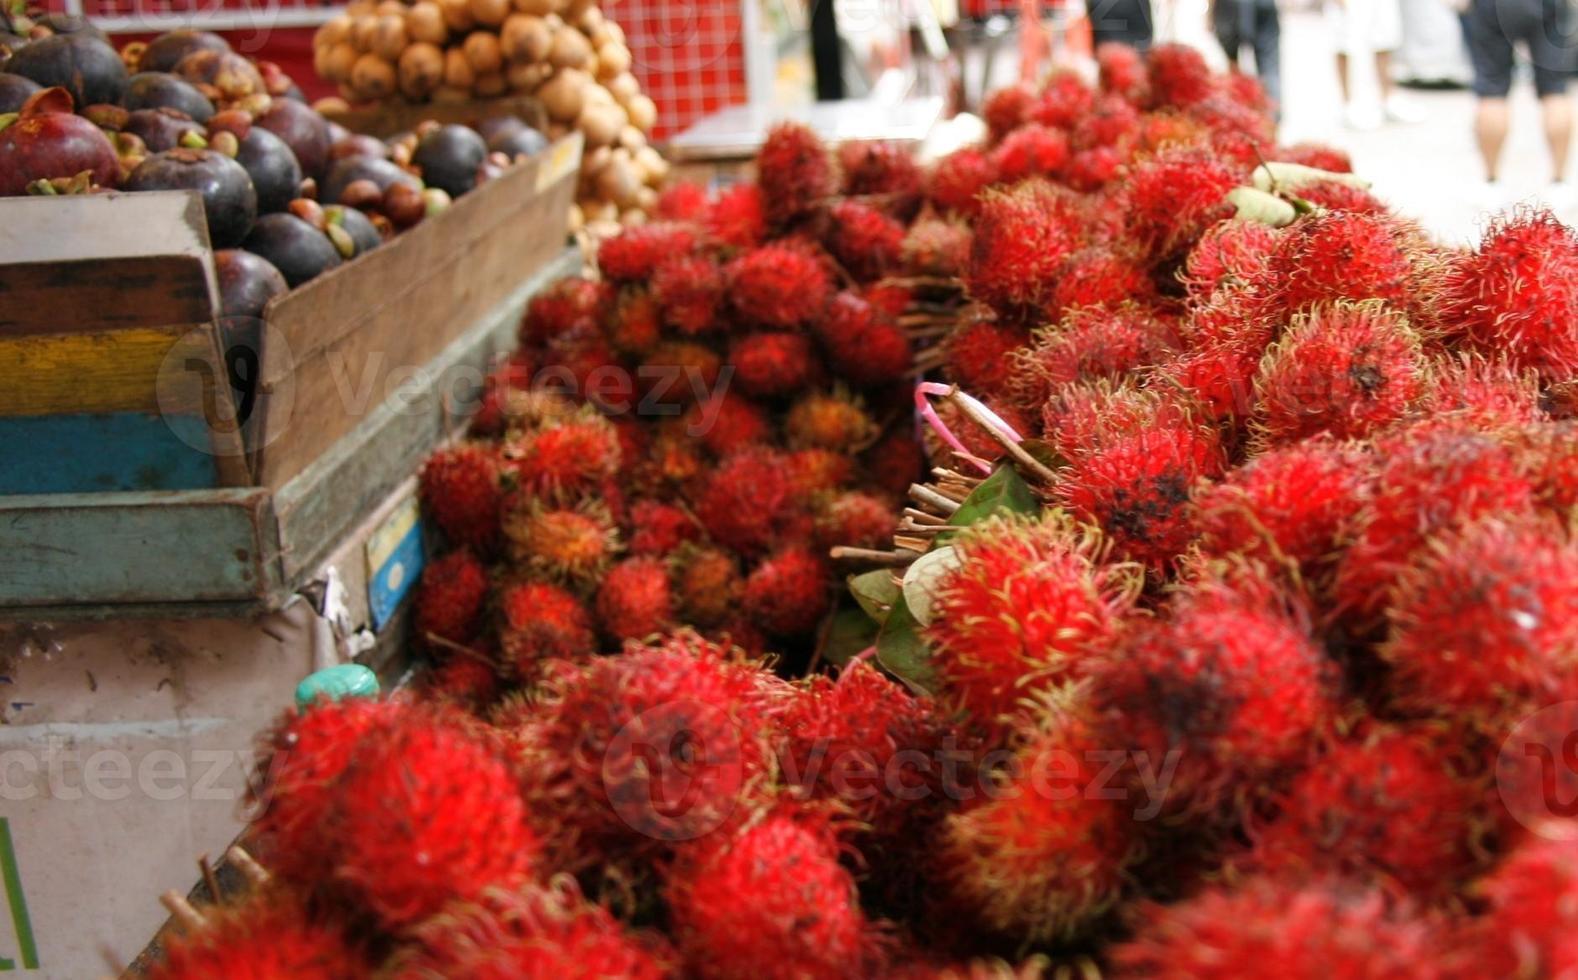 nourriture - fruits - ramboutan photo